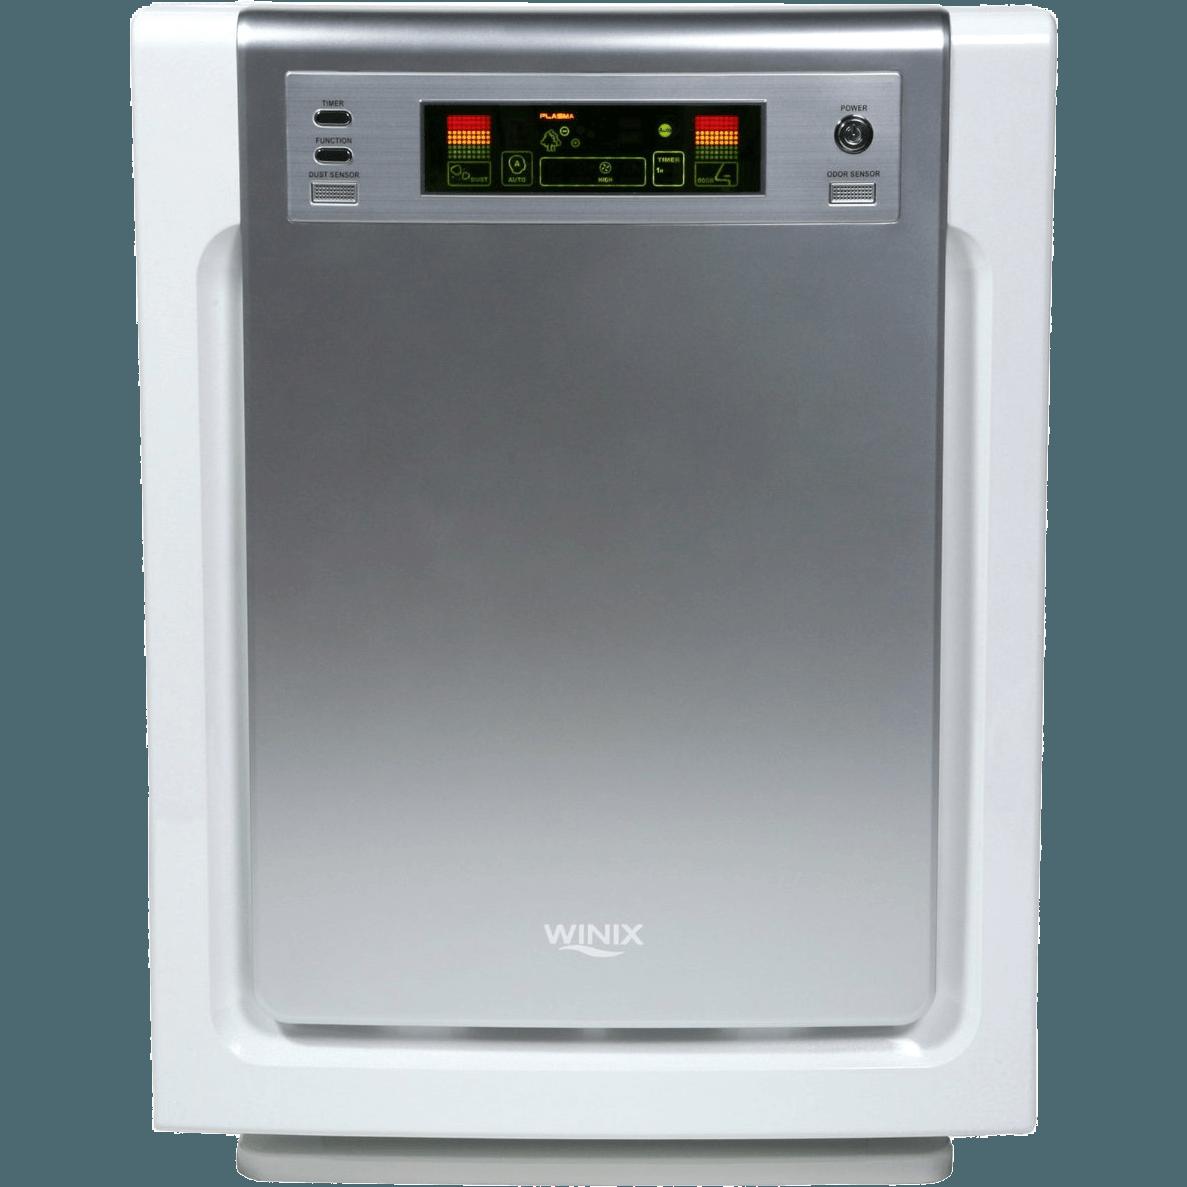 Winix HR900 Ultimate Pet Air Purifier Sylvane Air